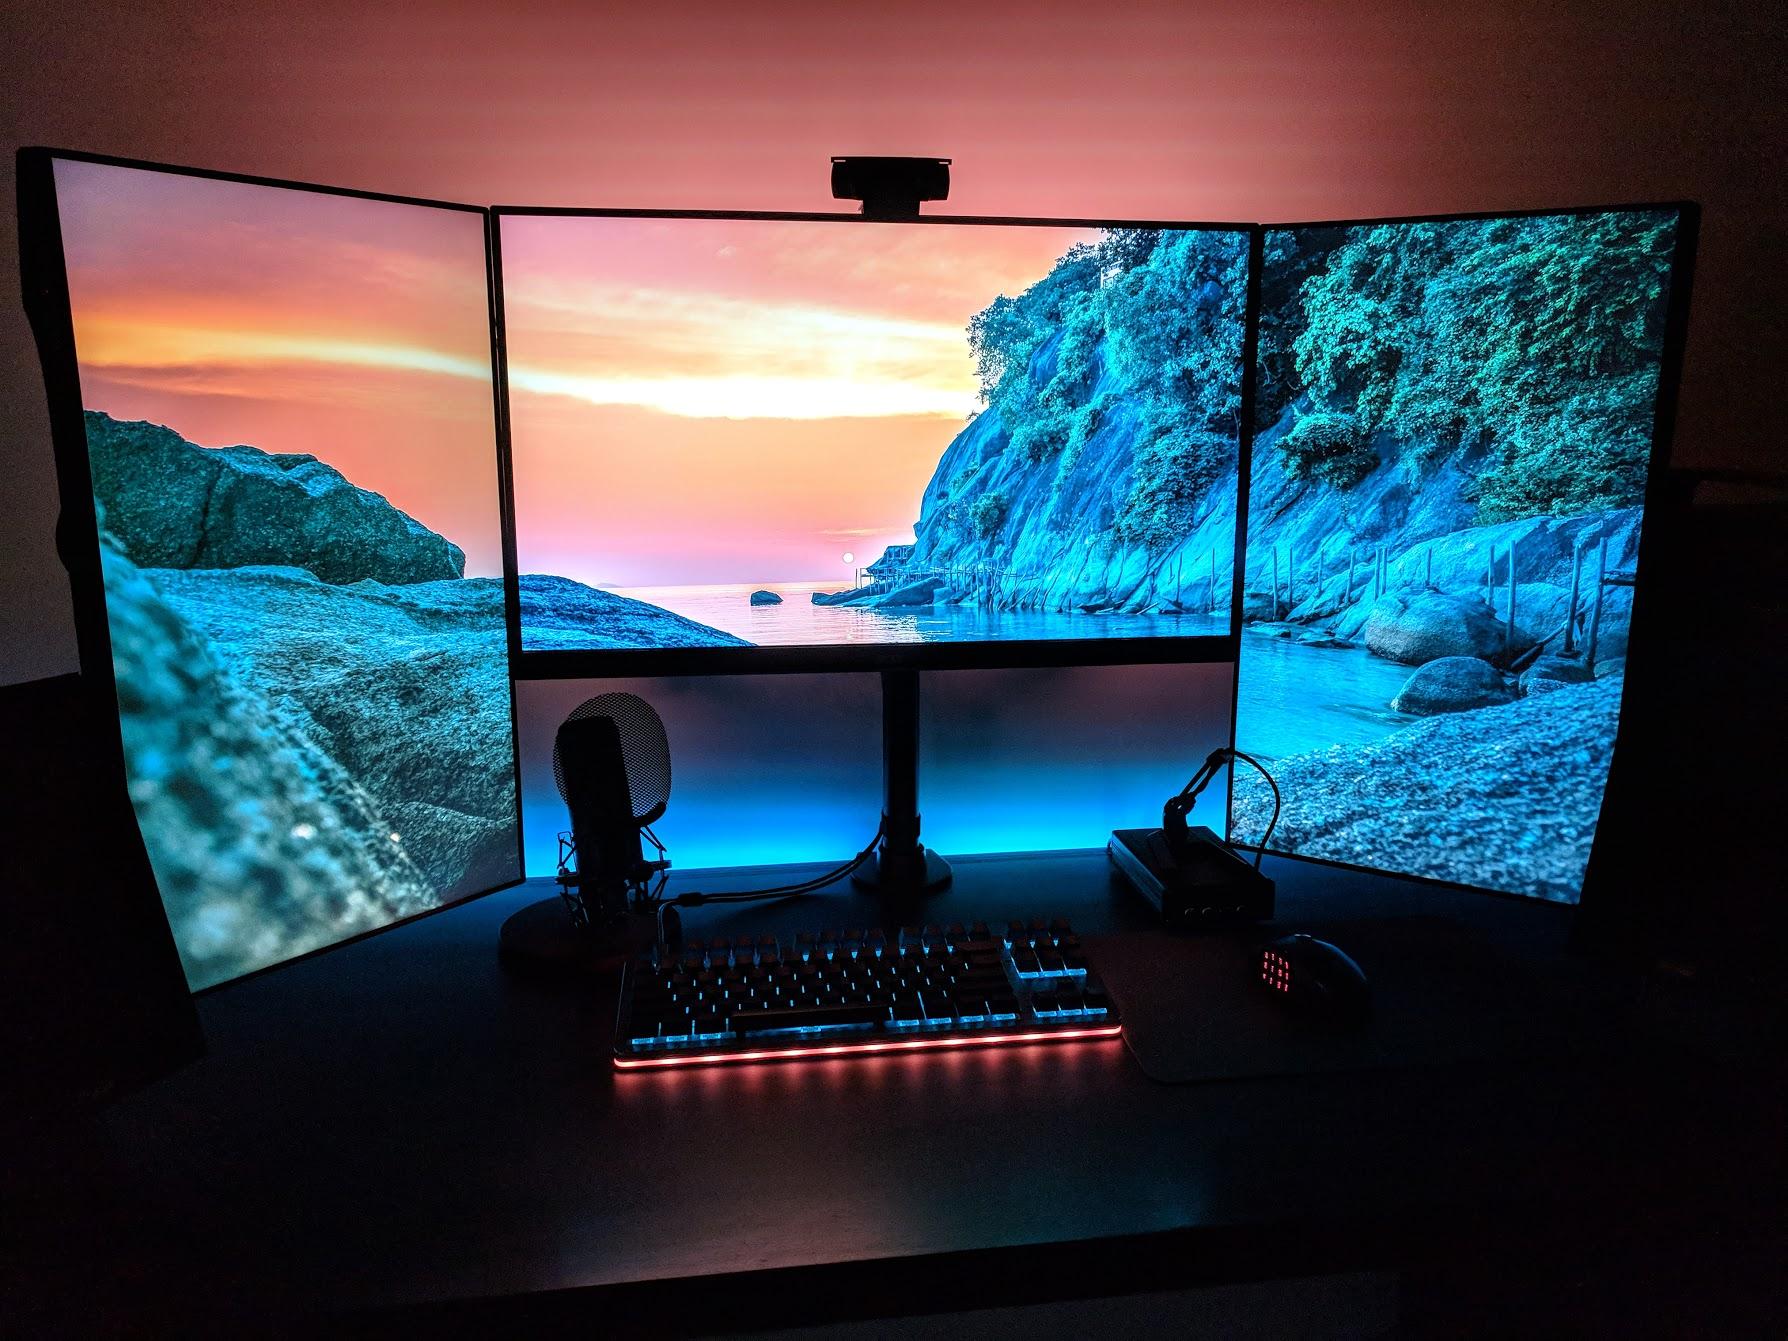 Mid Completion On My Updated Office Battlestation Computer Desk Setup Video Game Rooms Video Game Room Design